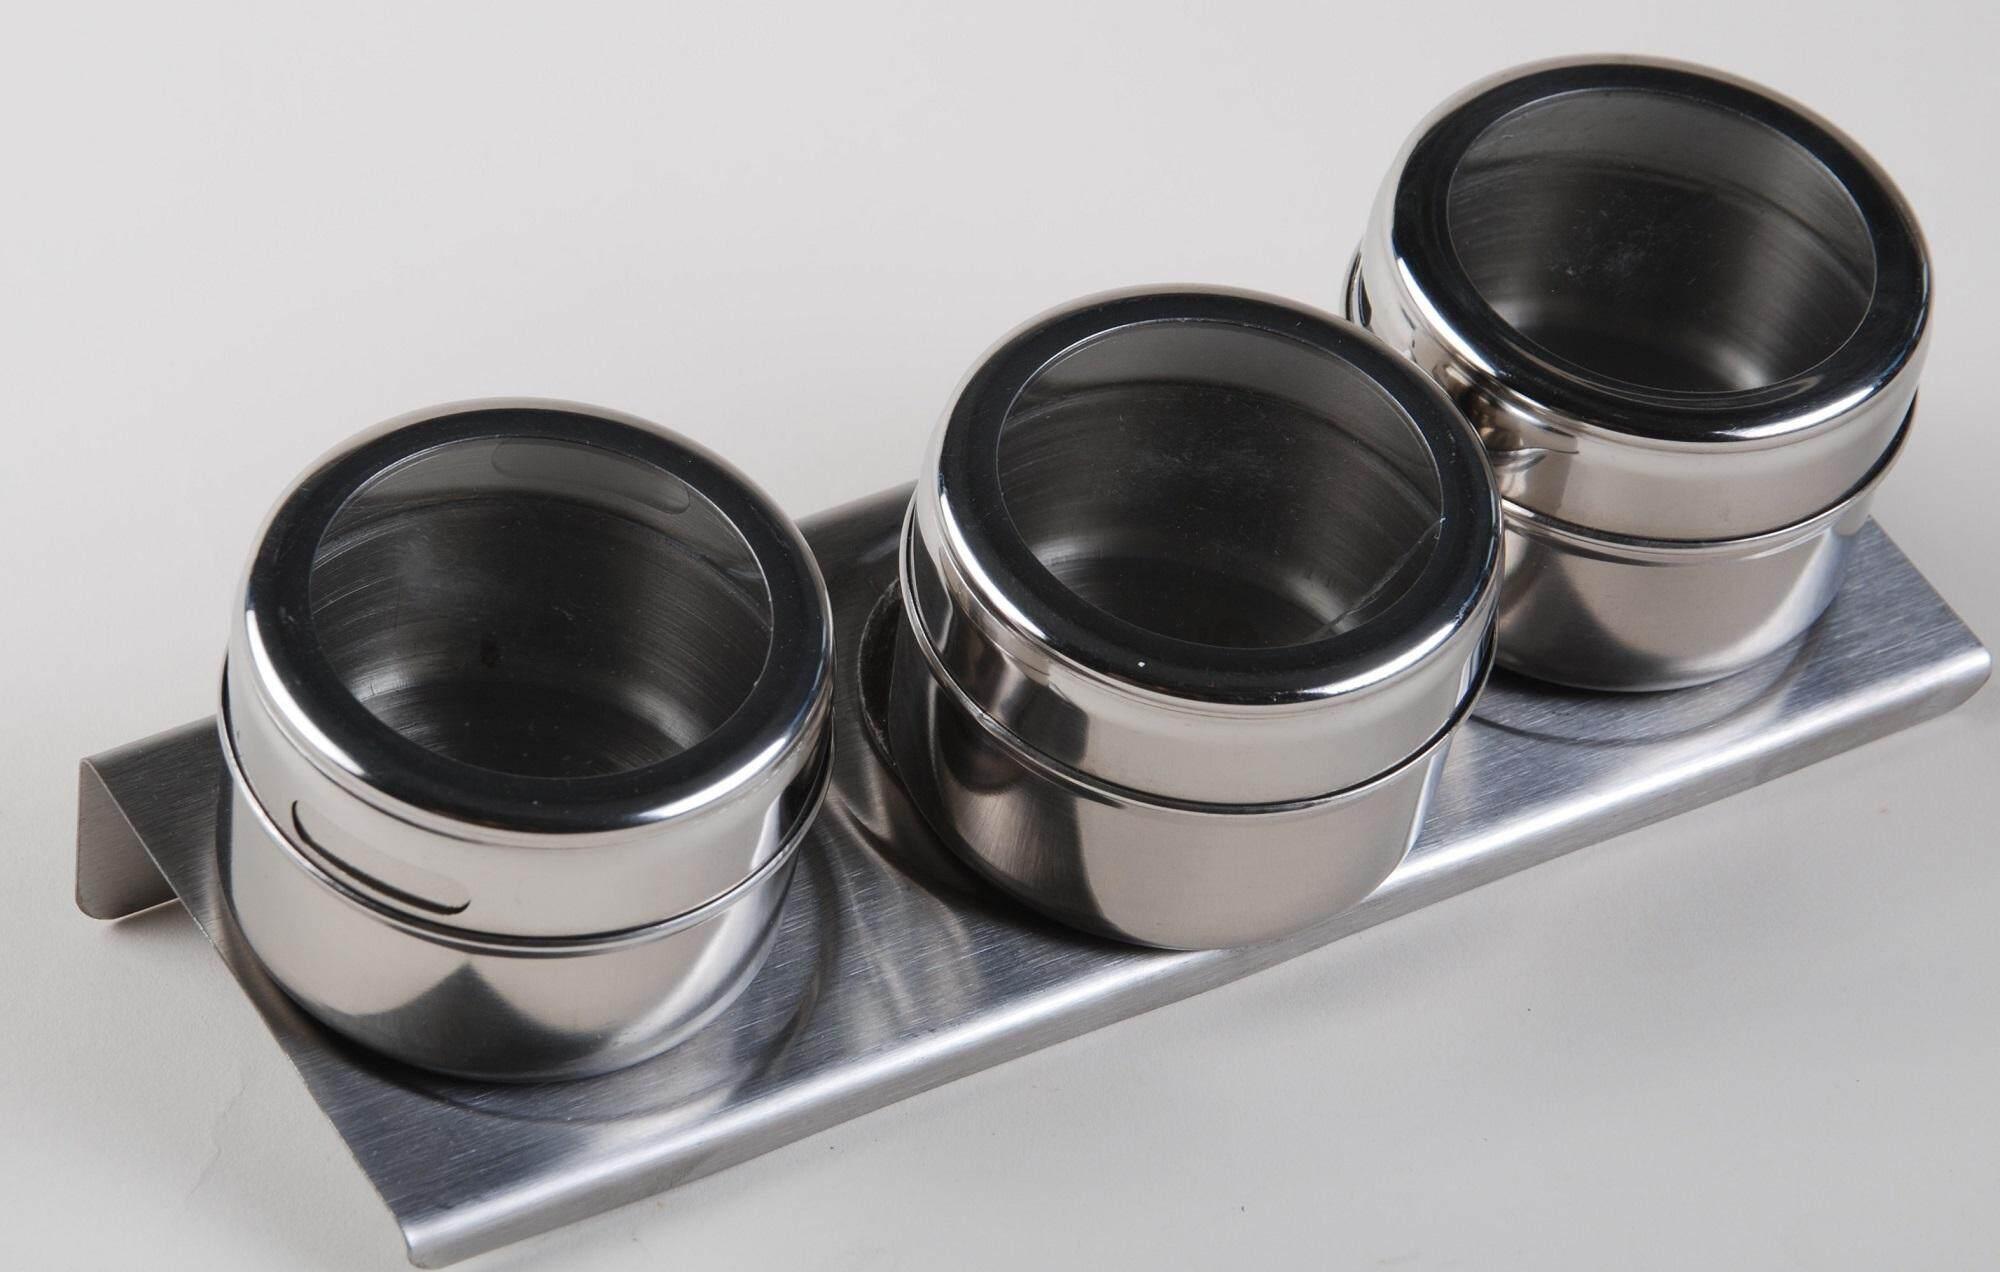 Fitur Wadah Penyaji Prasmanan Stainless 3 Set Bonus Pcs Sendok Lengkap 24 Pc Little Homes Steel Condiment 2746